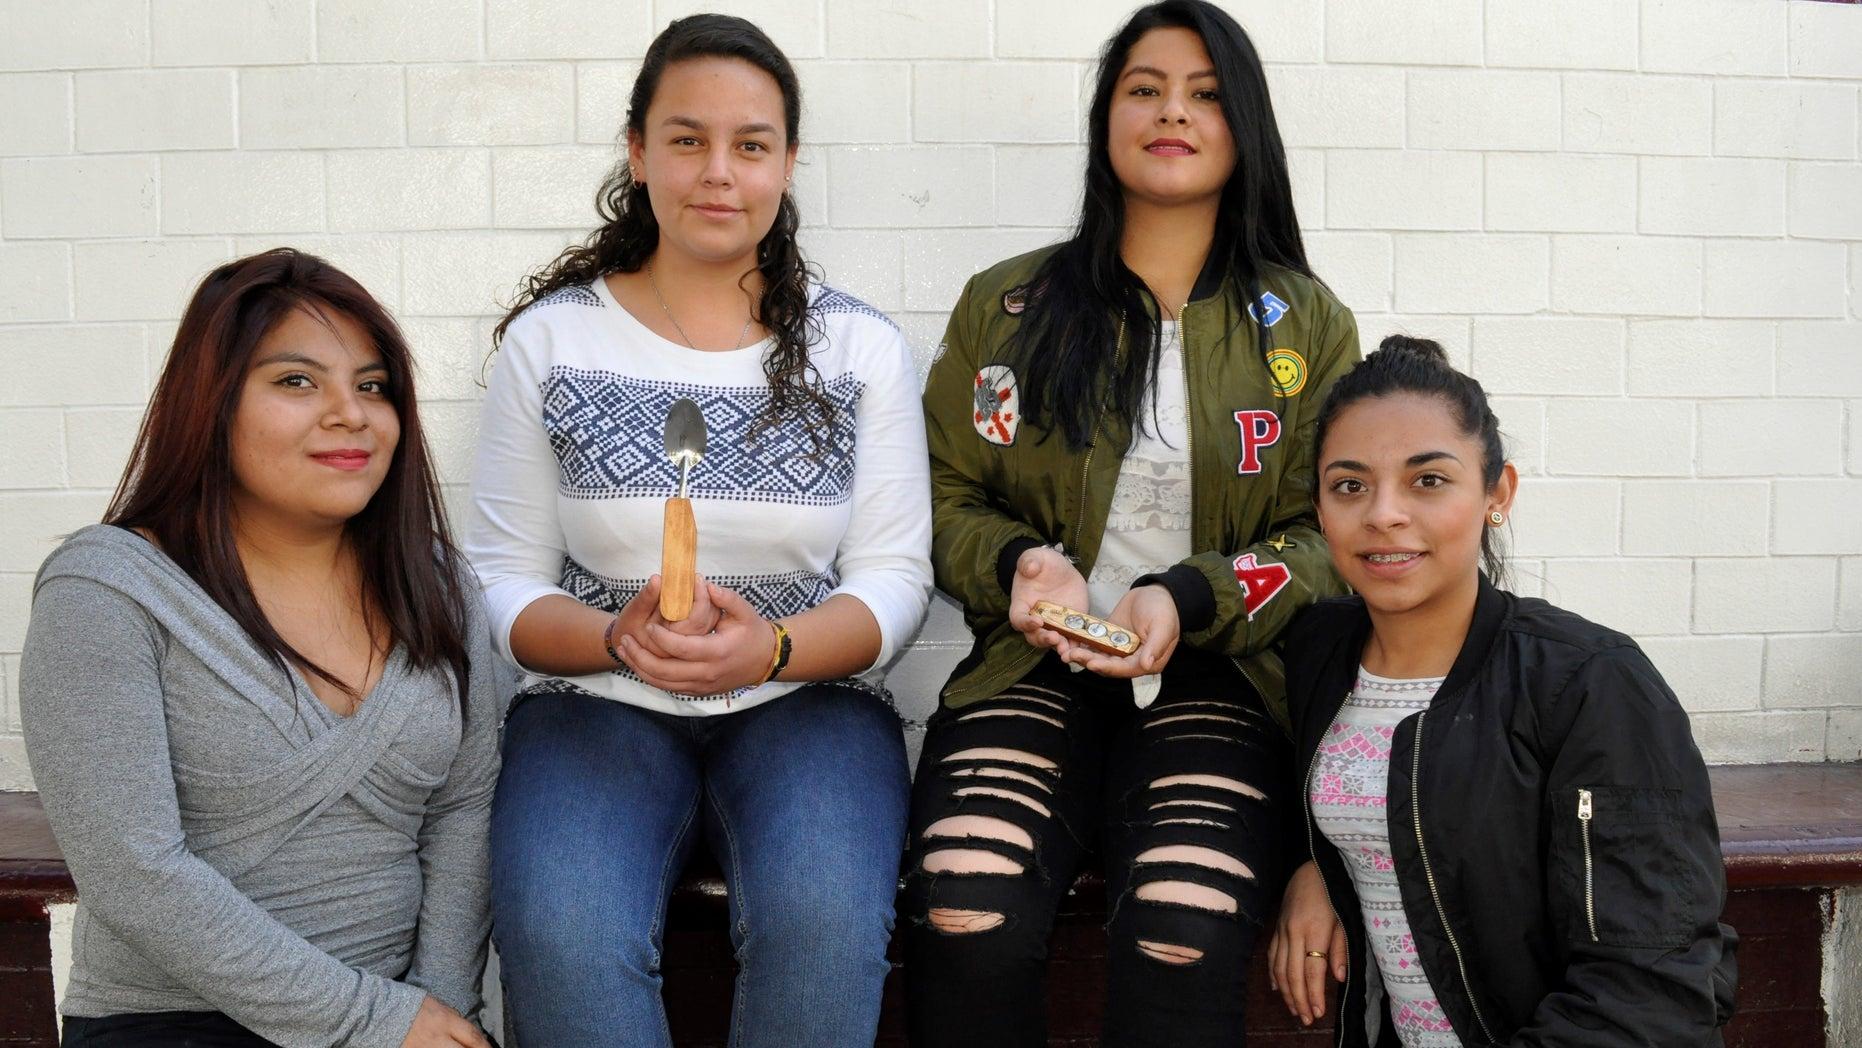 Tania Yolotzin, Andrea Moreno, Maria Caudillo and Cinthia Padilla.